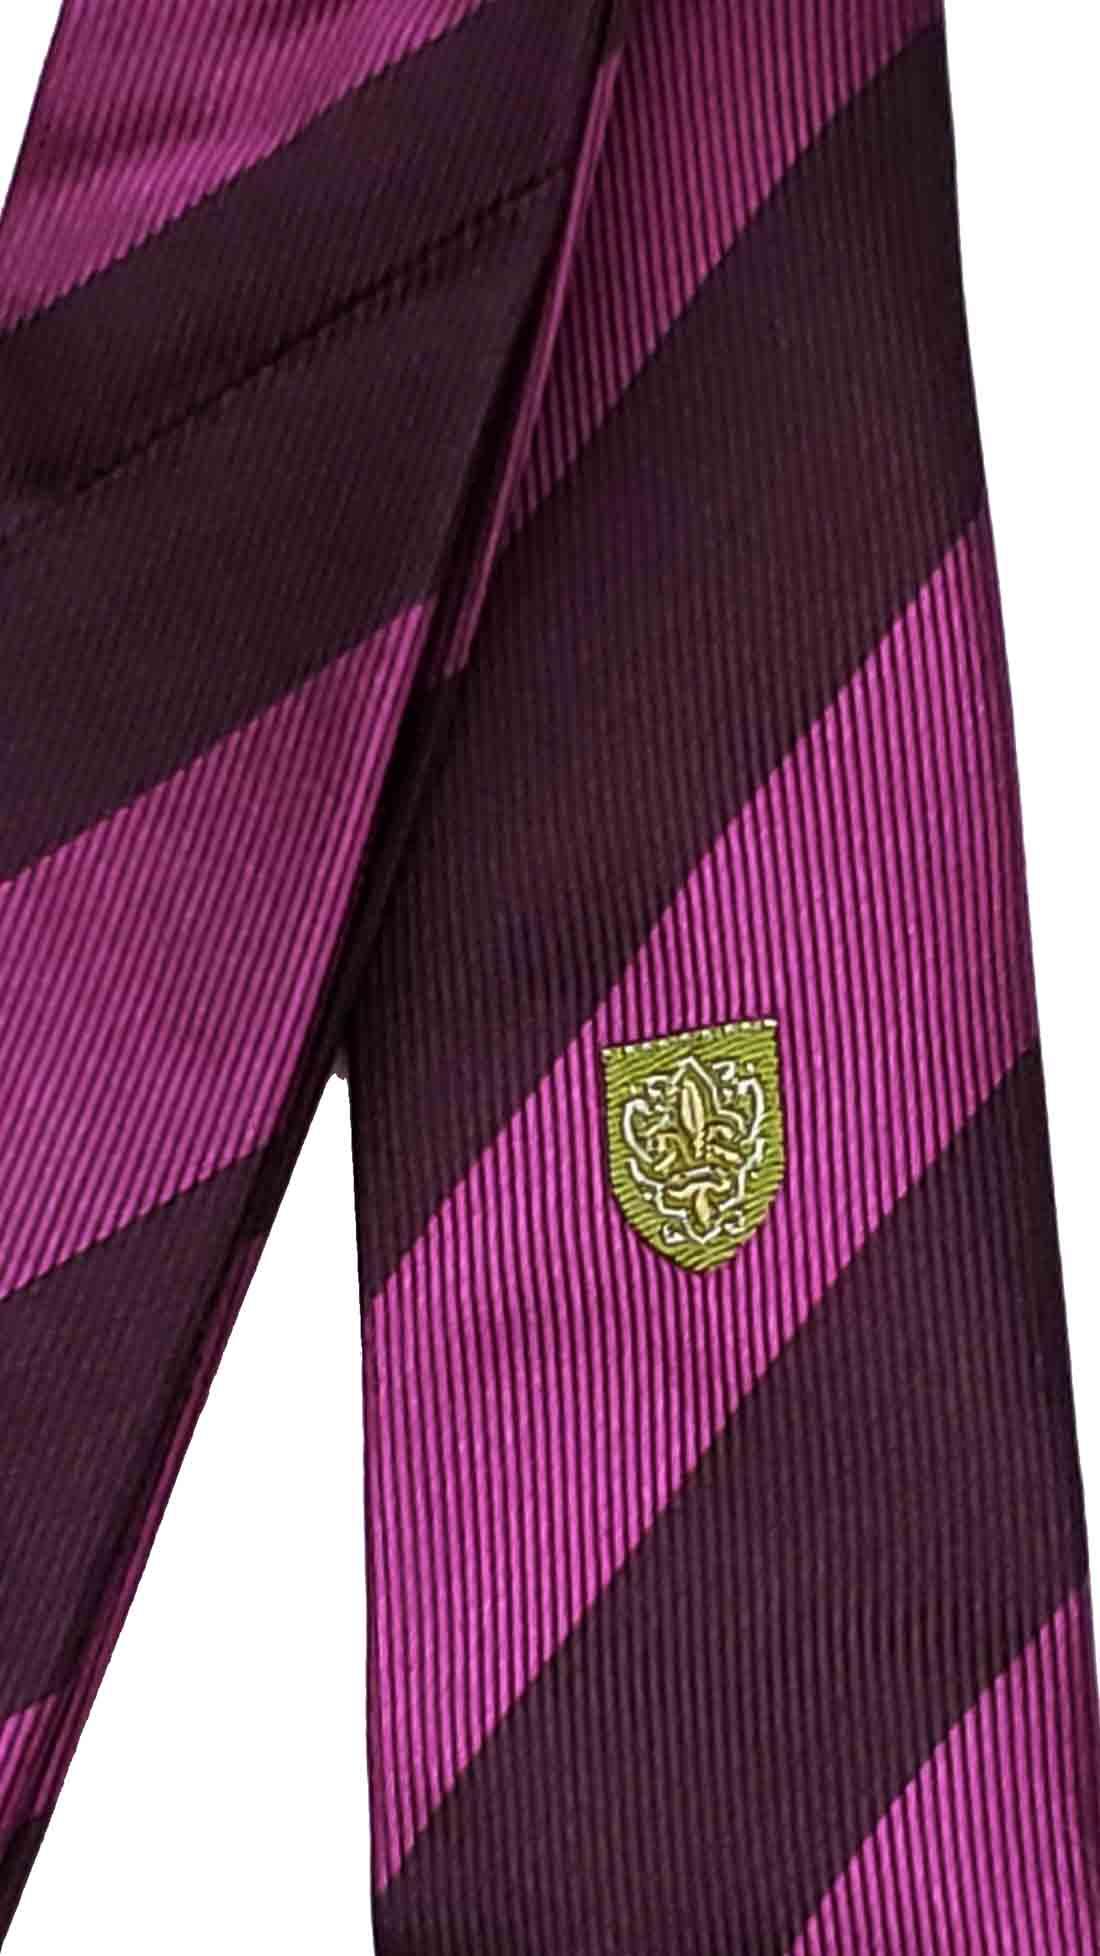 Zara Silk Tie Purple Brown Striped Green Gold Shield Emblem Men's Skinny